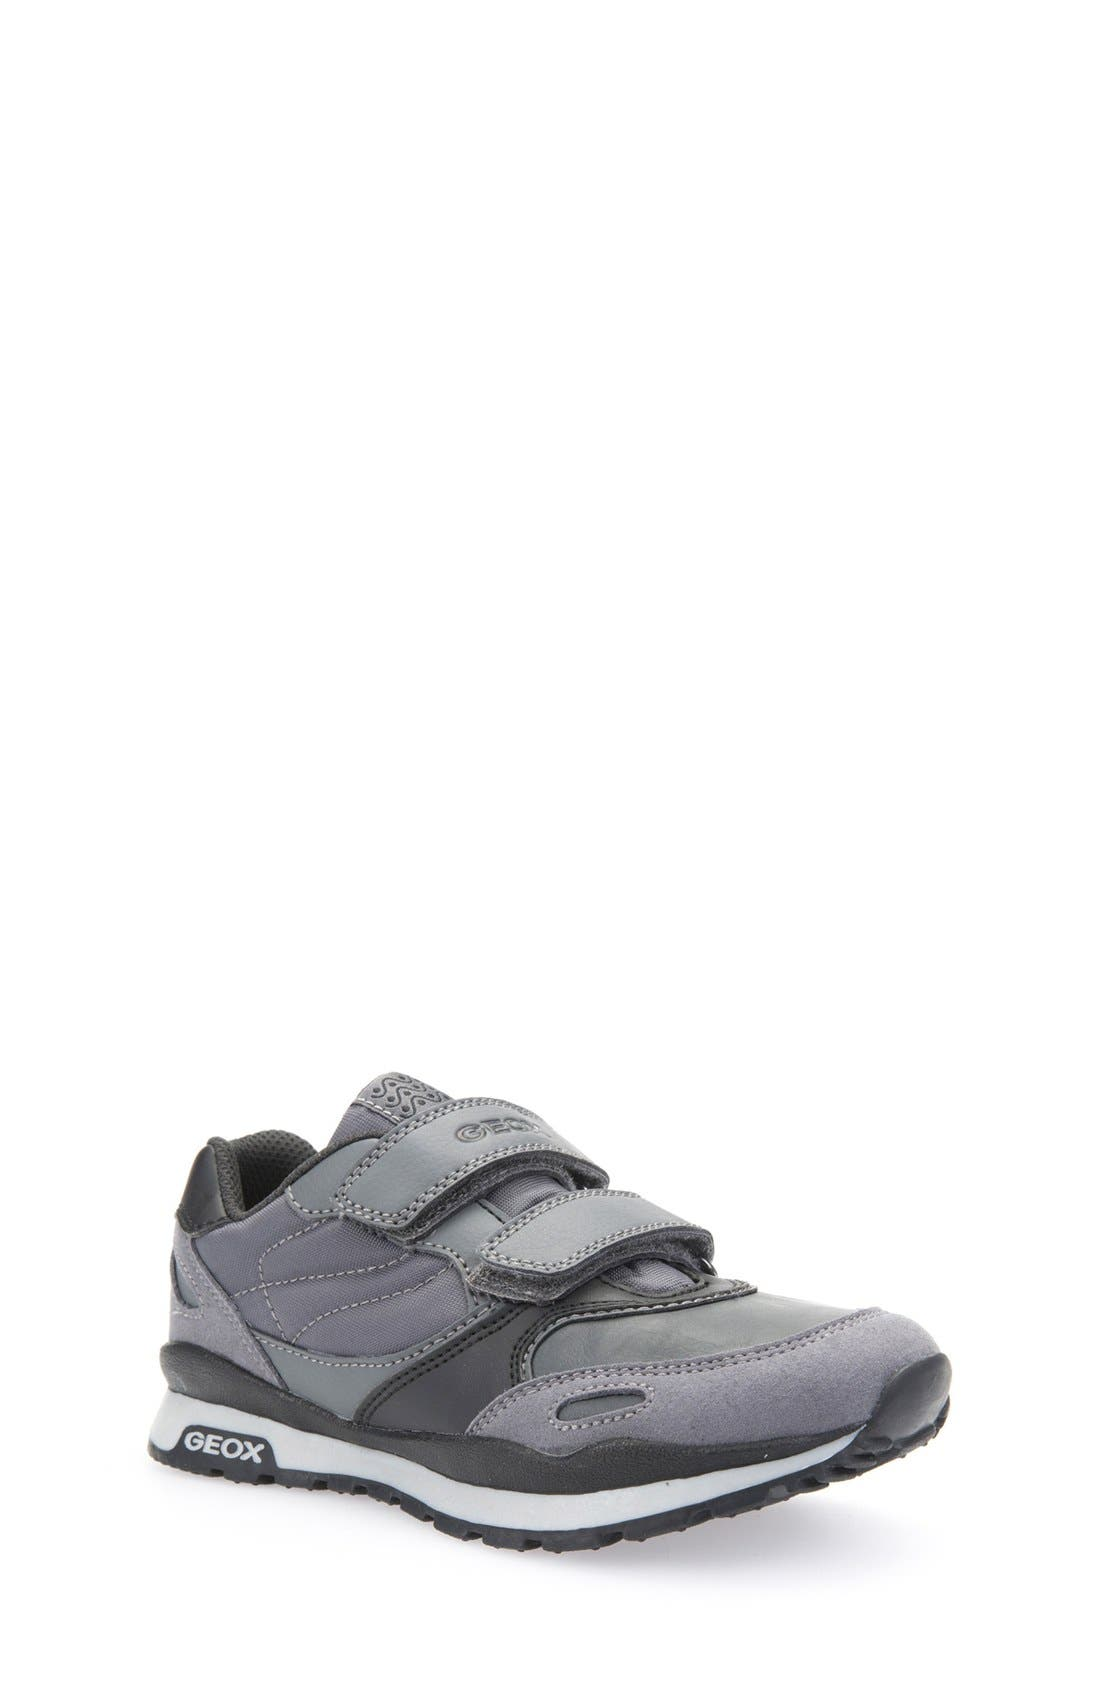 Pavel Sneaker,                         Main,                         color, Dark Grey/ Black